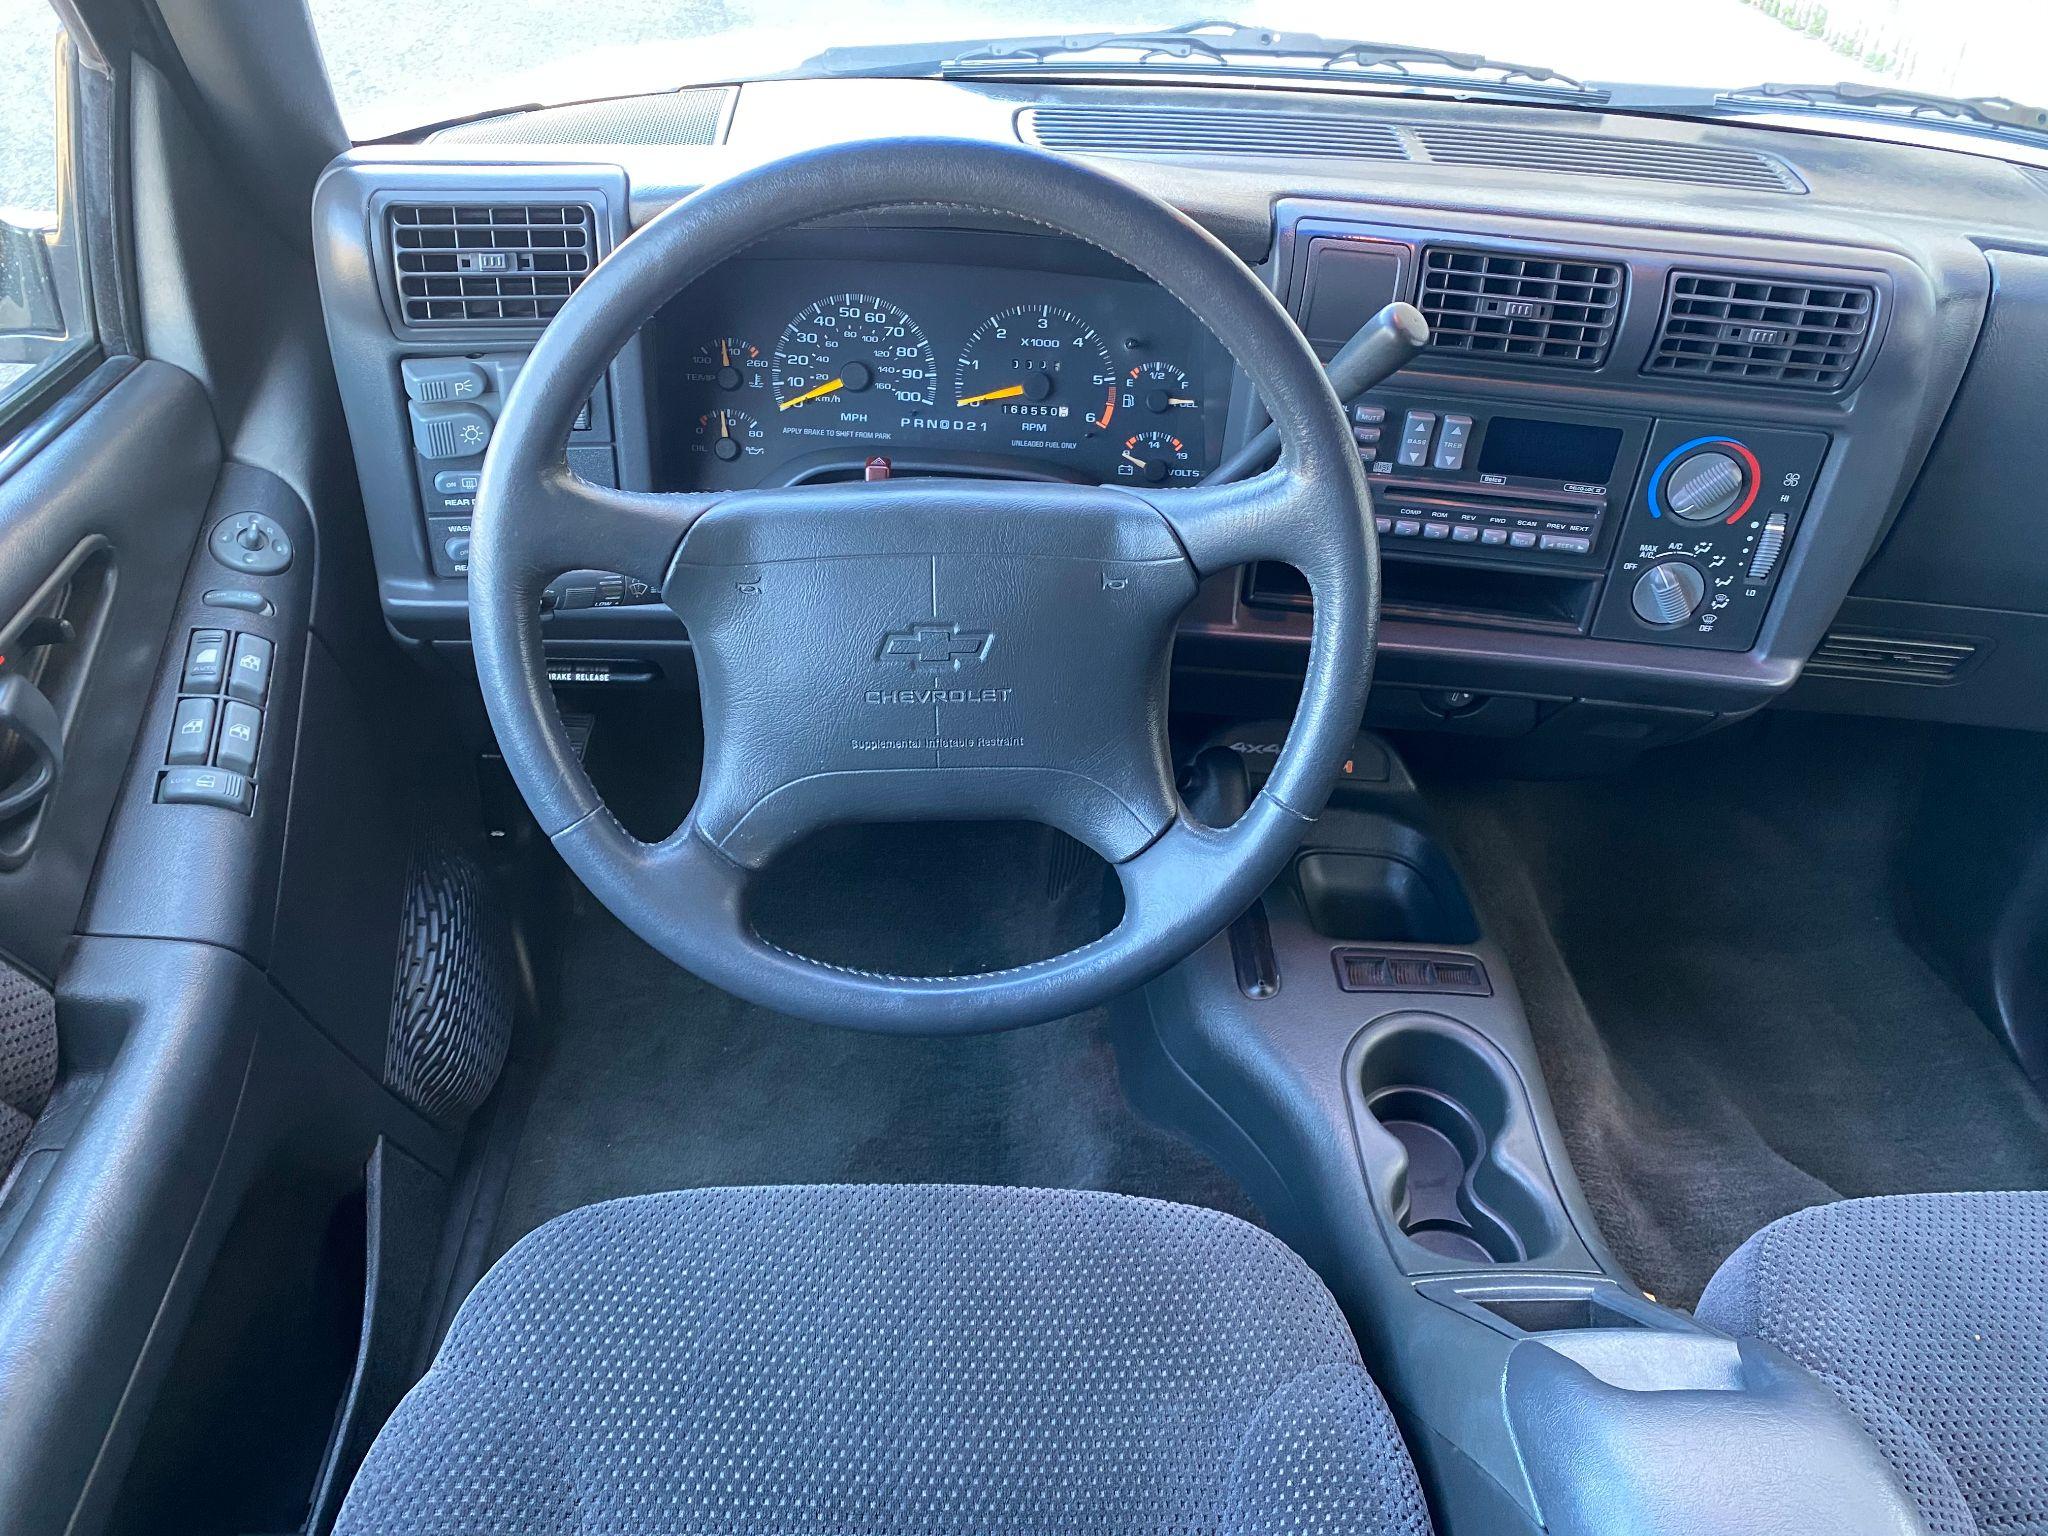 1996 Chevrolet Blazer LS